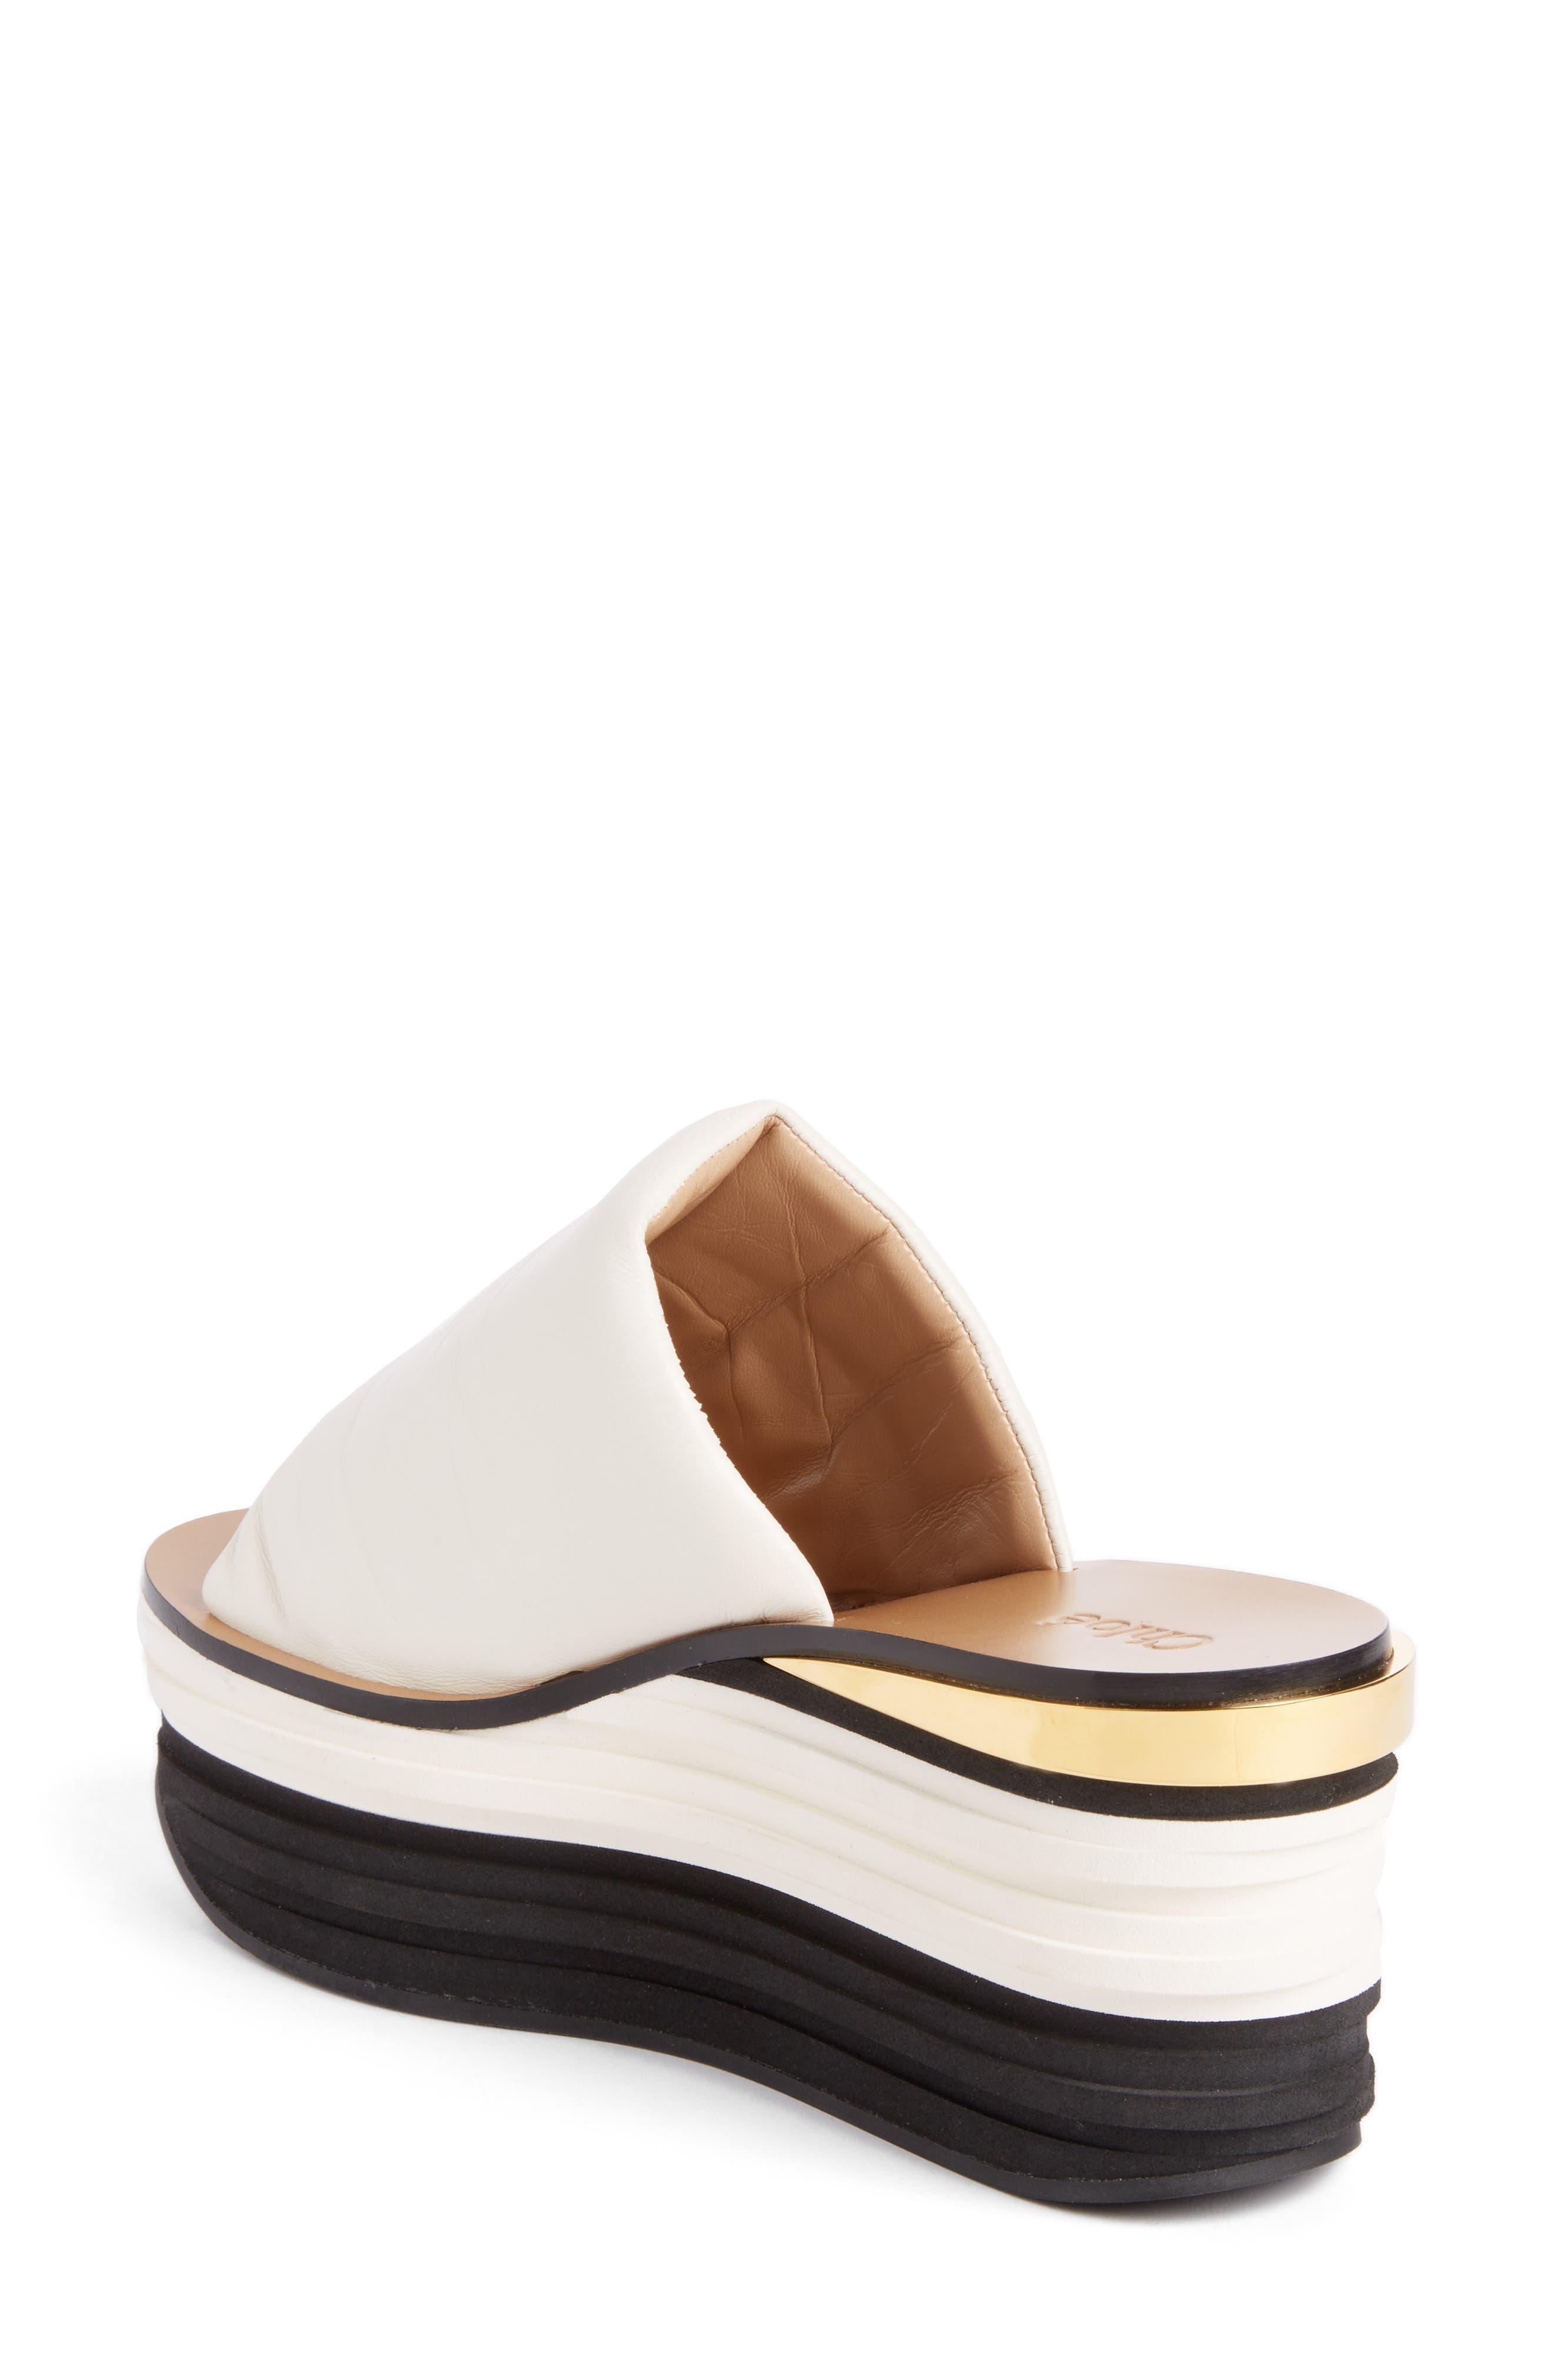 Camille Platform Sandal,                             Alternate thumbnail 2, color,                             WHITE